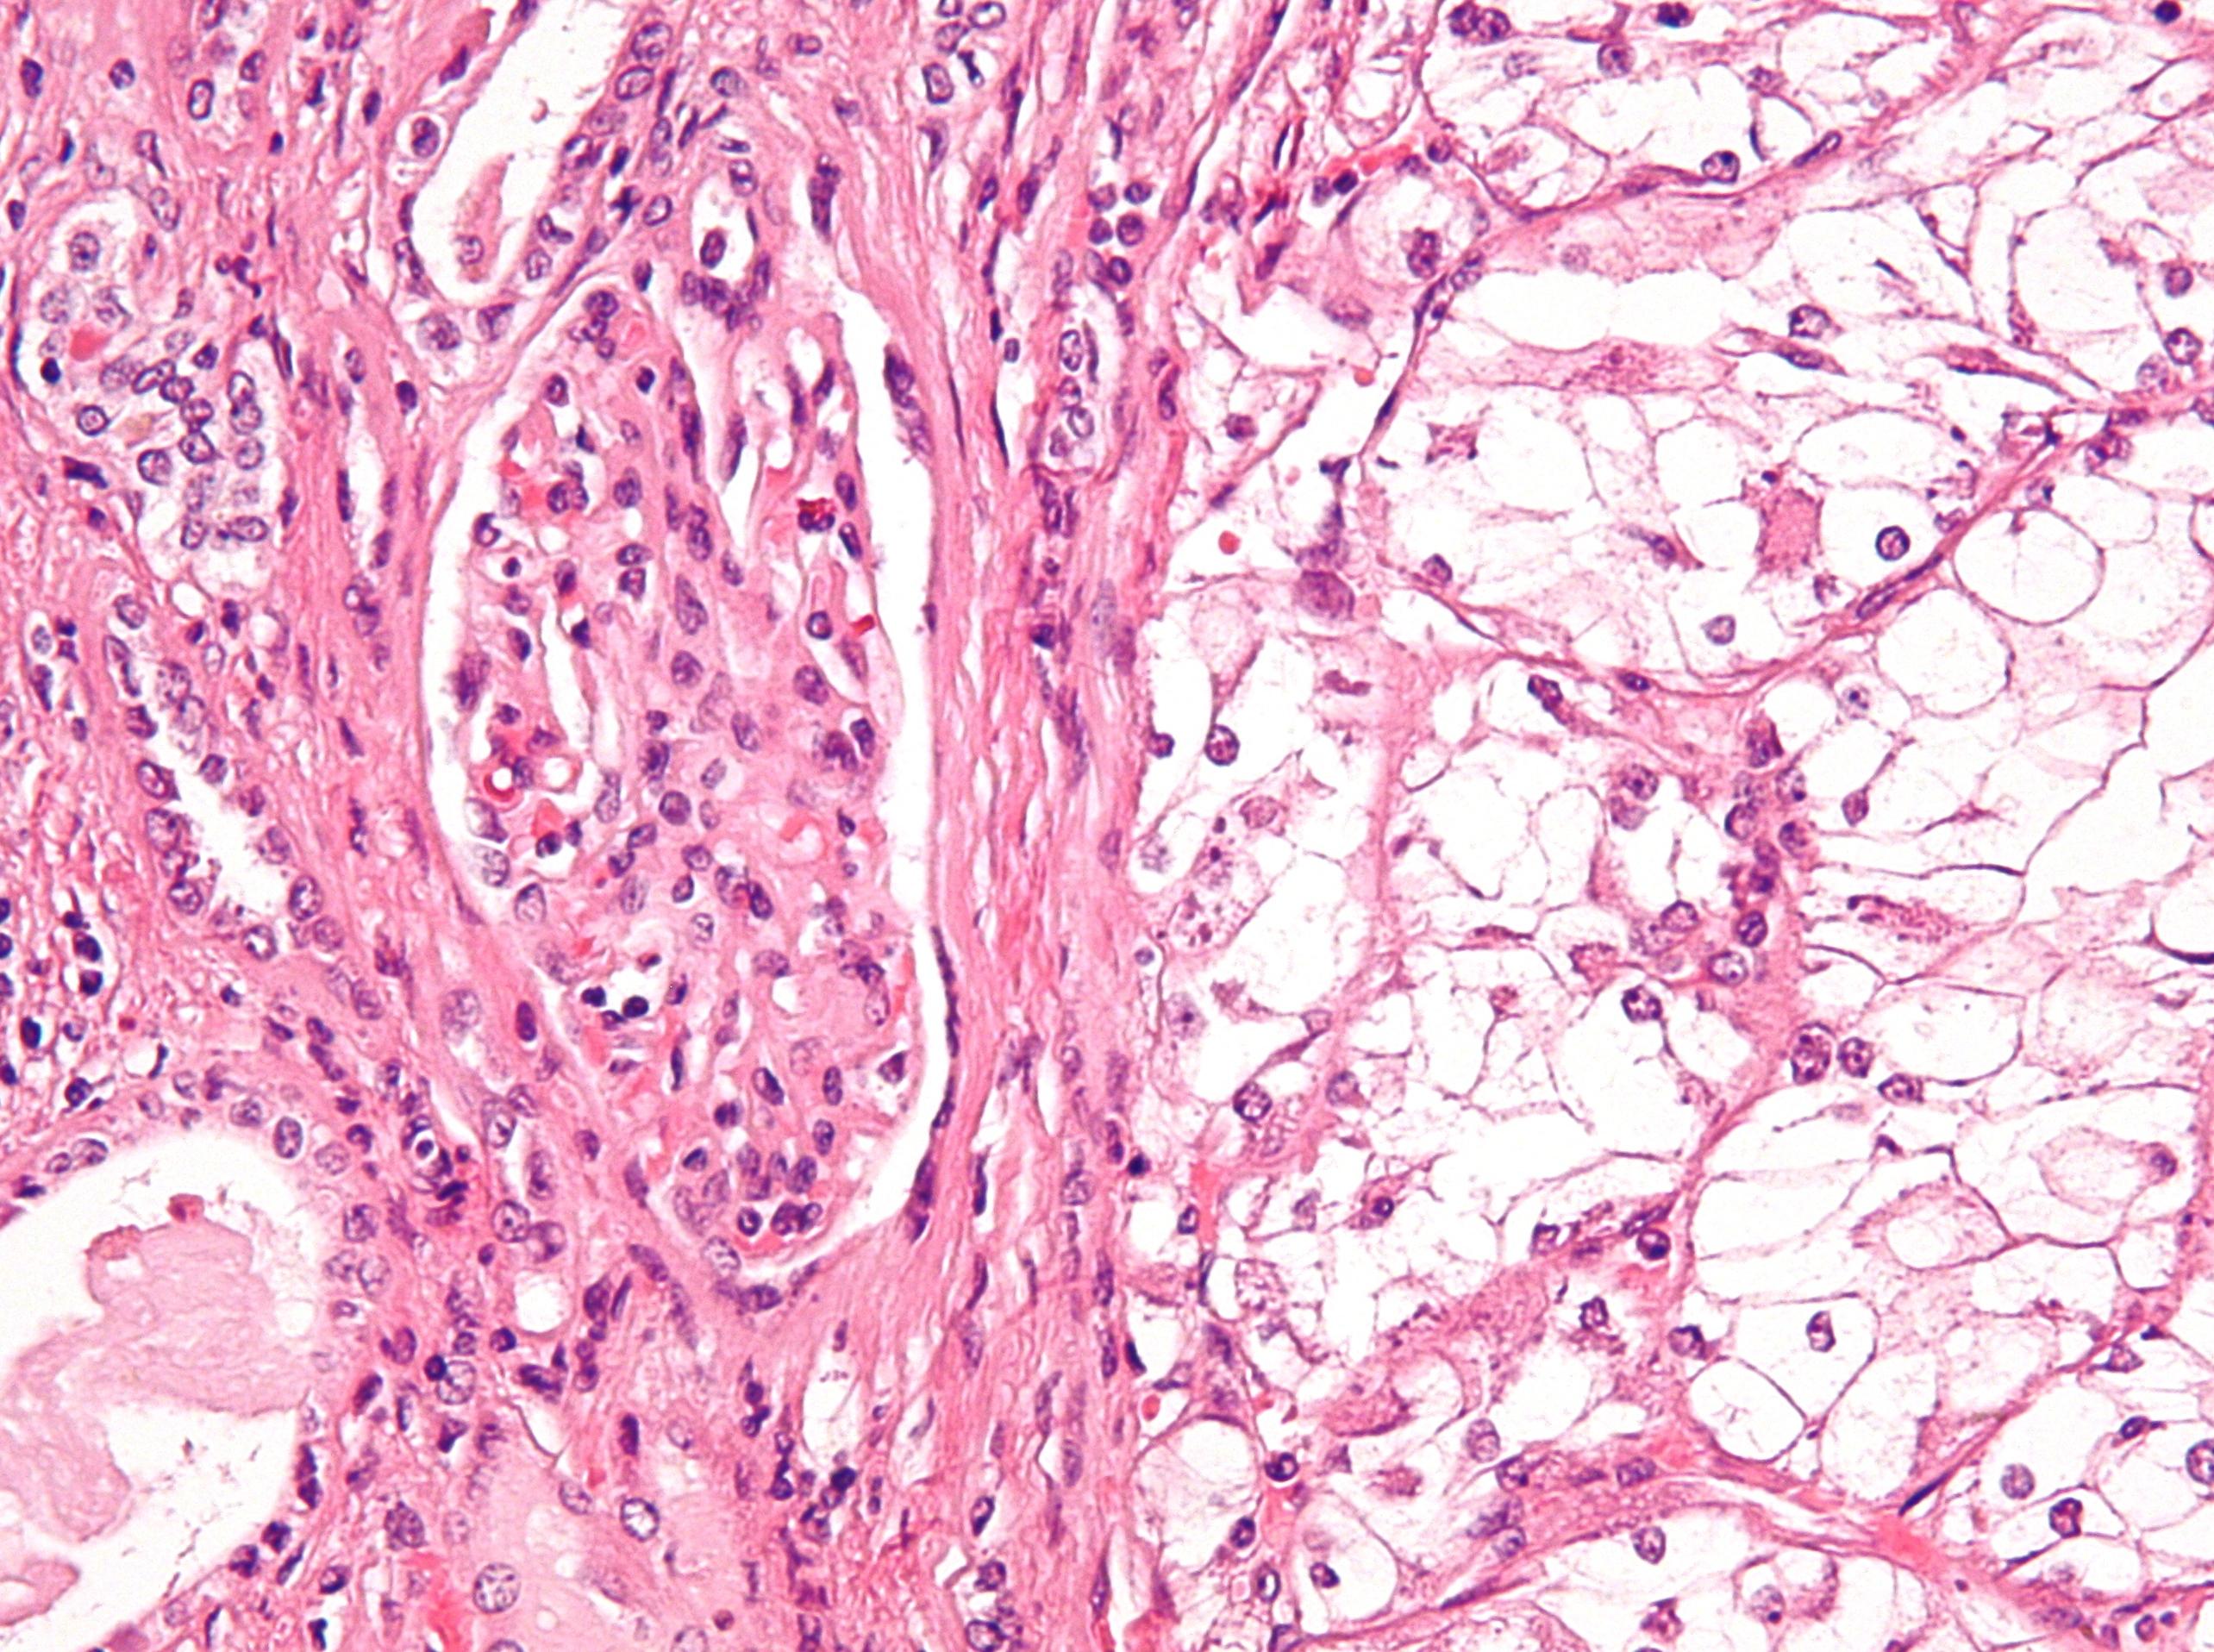 Cancerul renal | Spitalul Monza